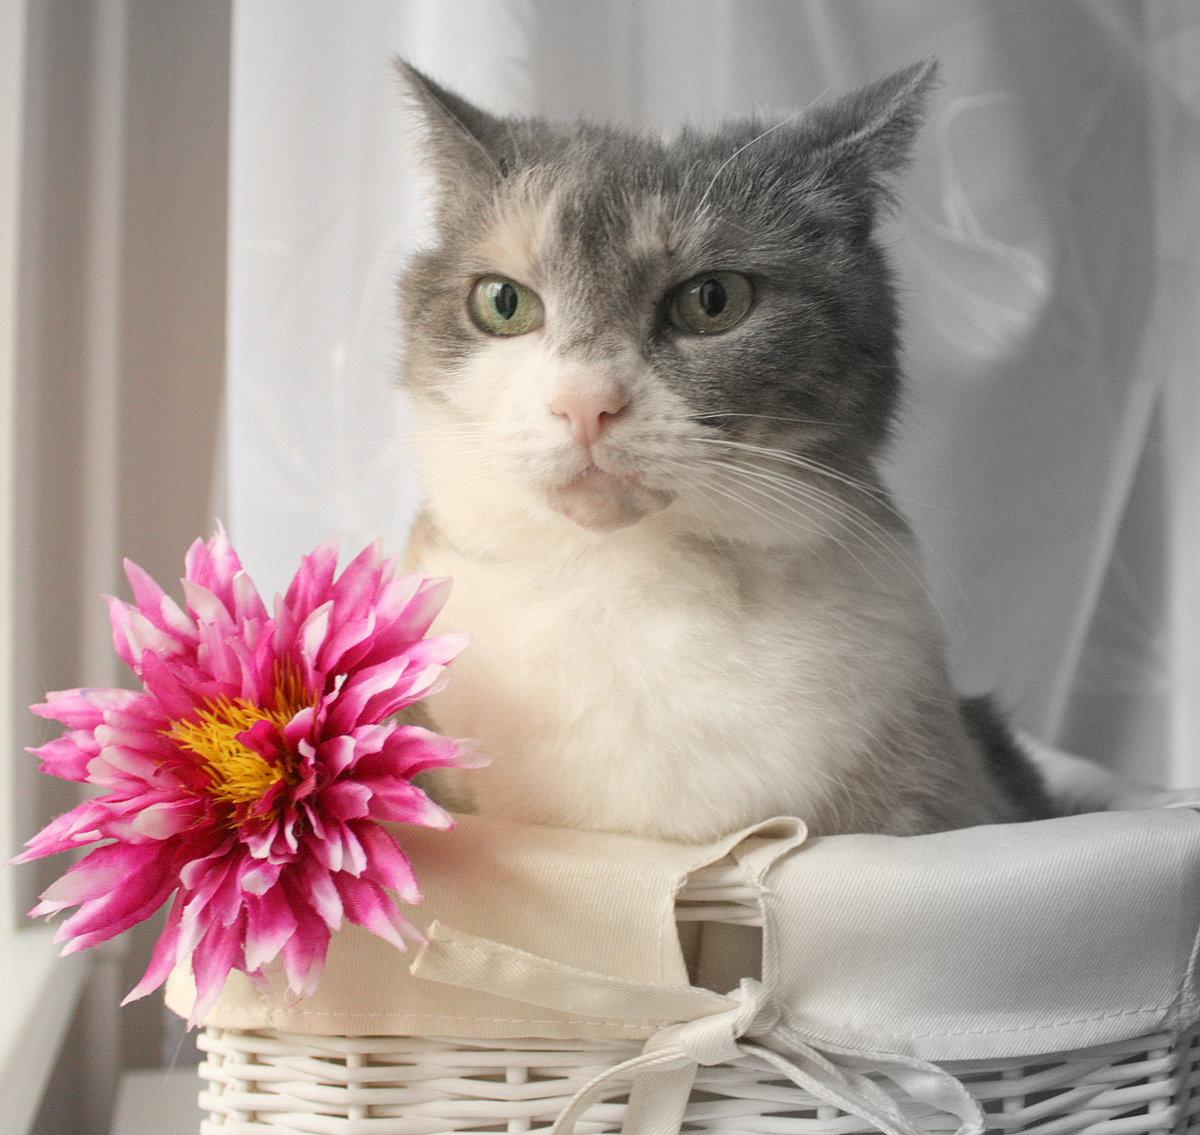 словам фото котики с цветами ногти